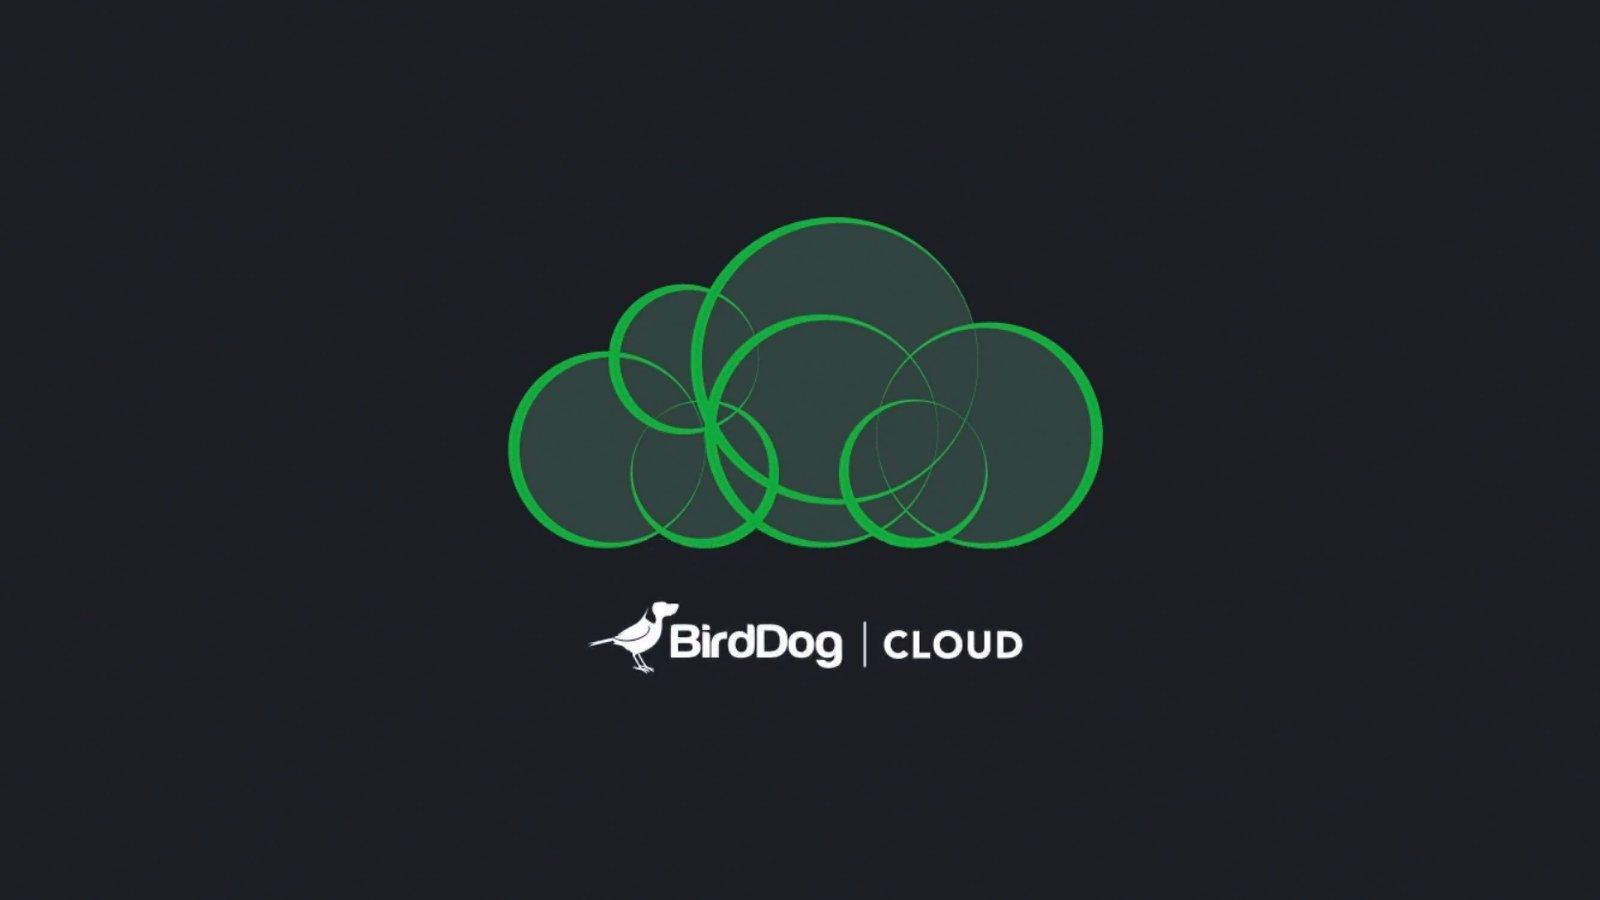 BirdDog Cloud